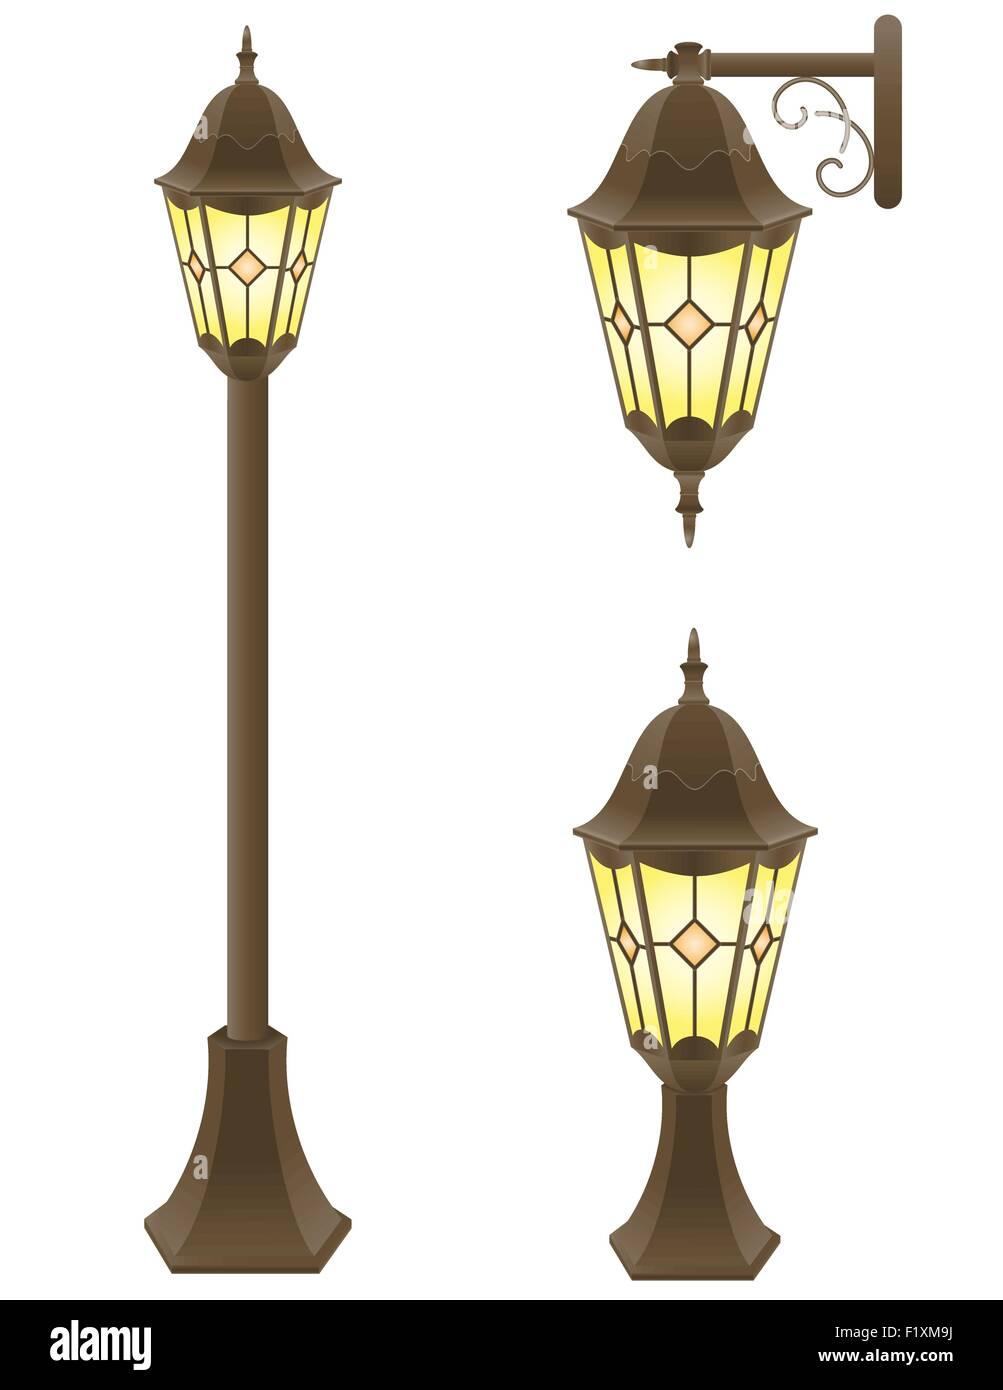 streetlight vector illustration isolated on white background Stock Vector